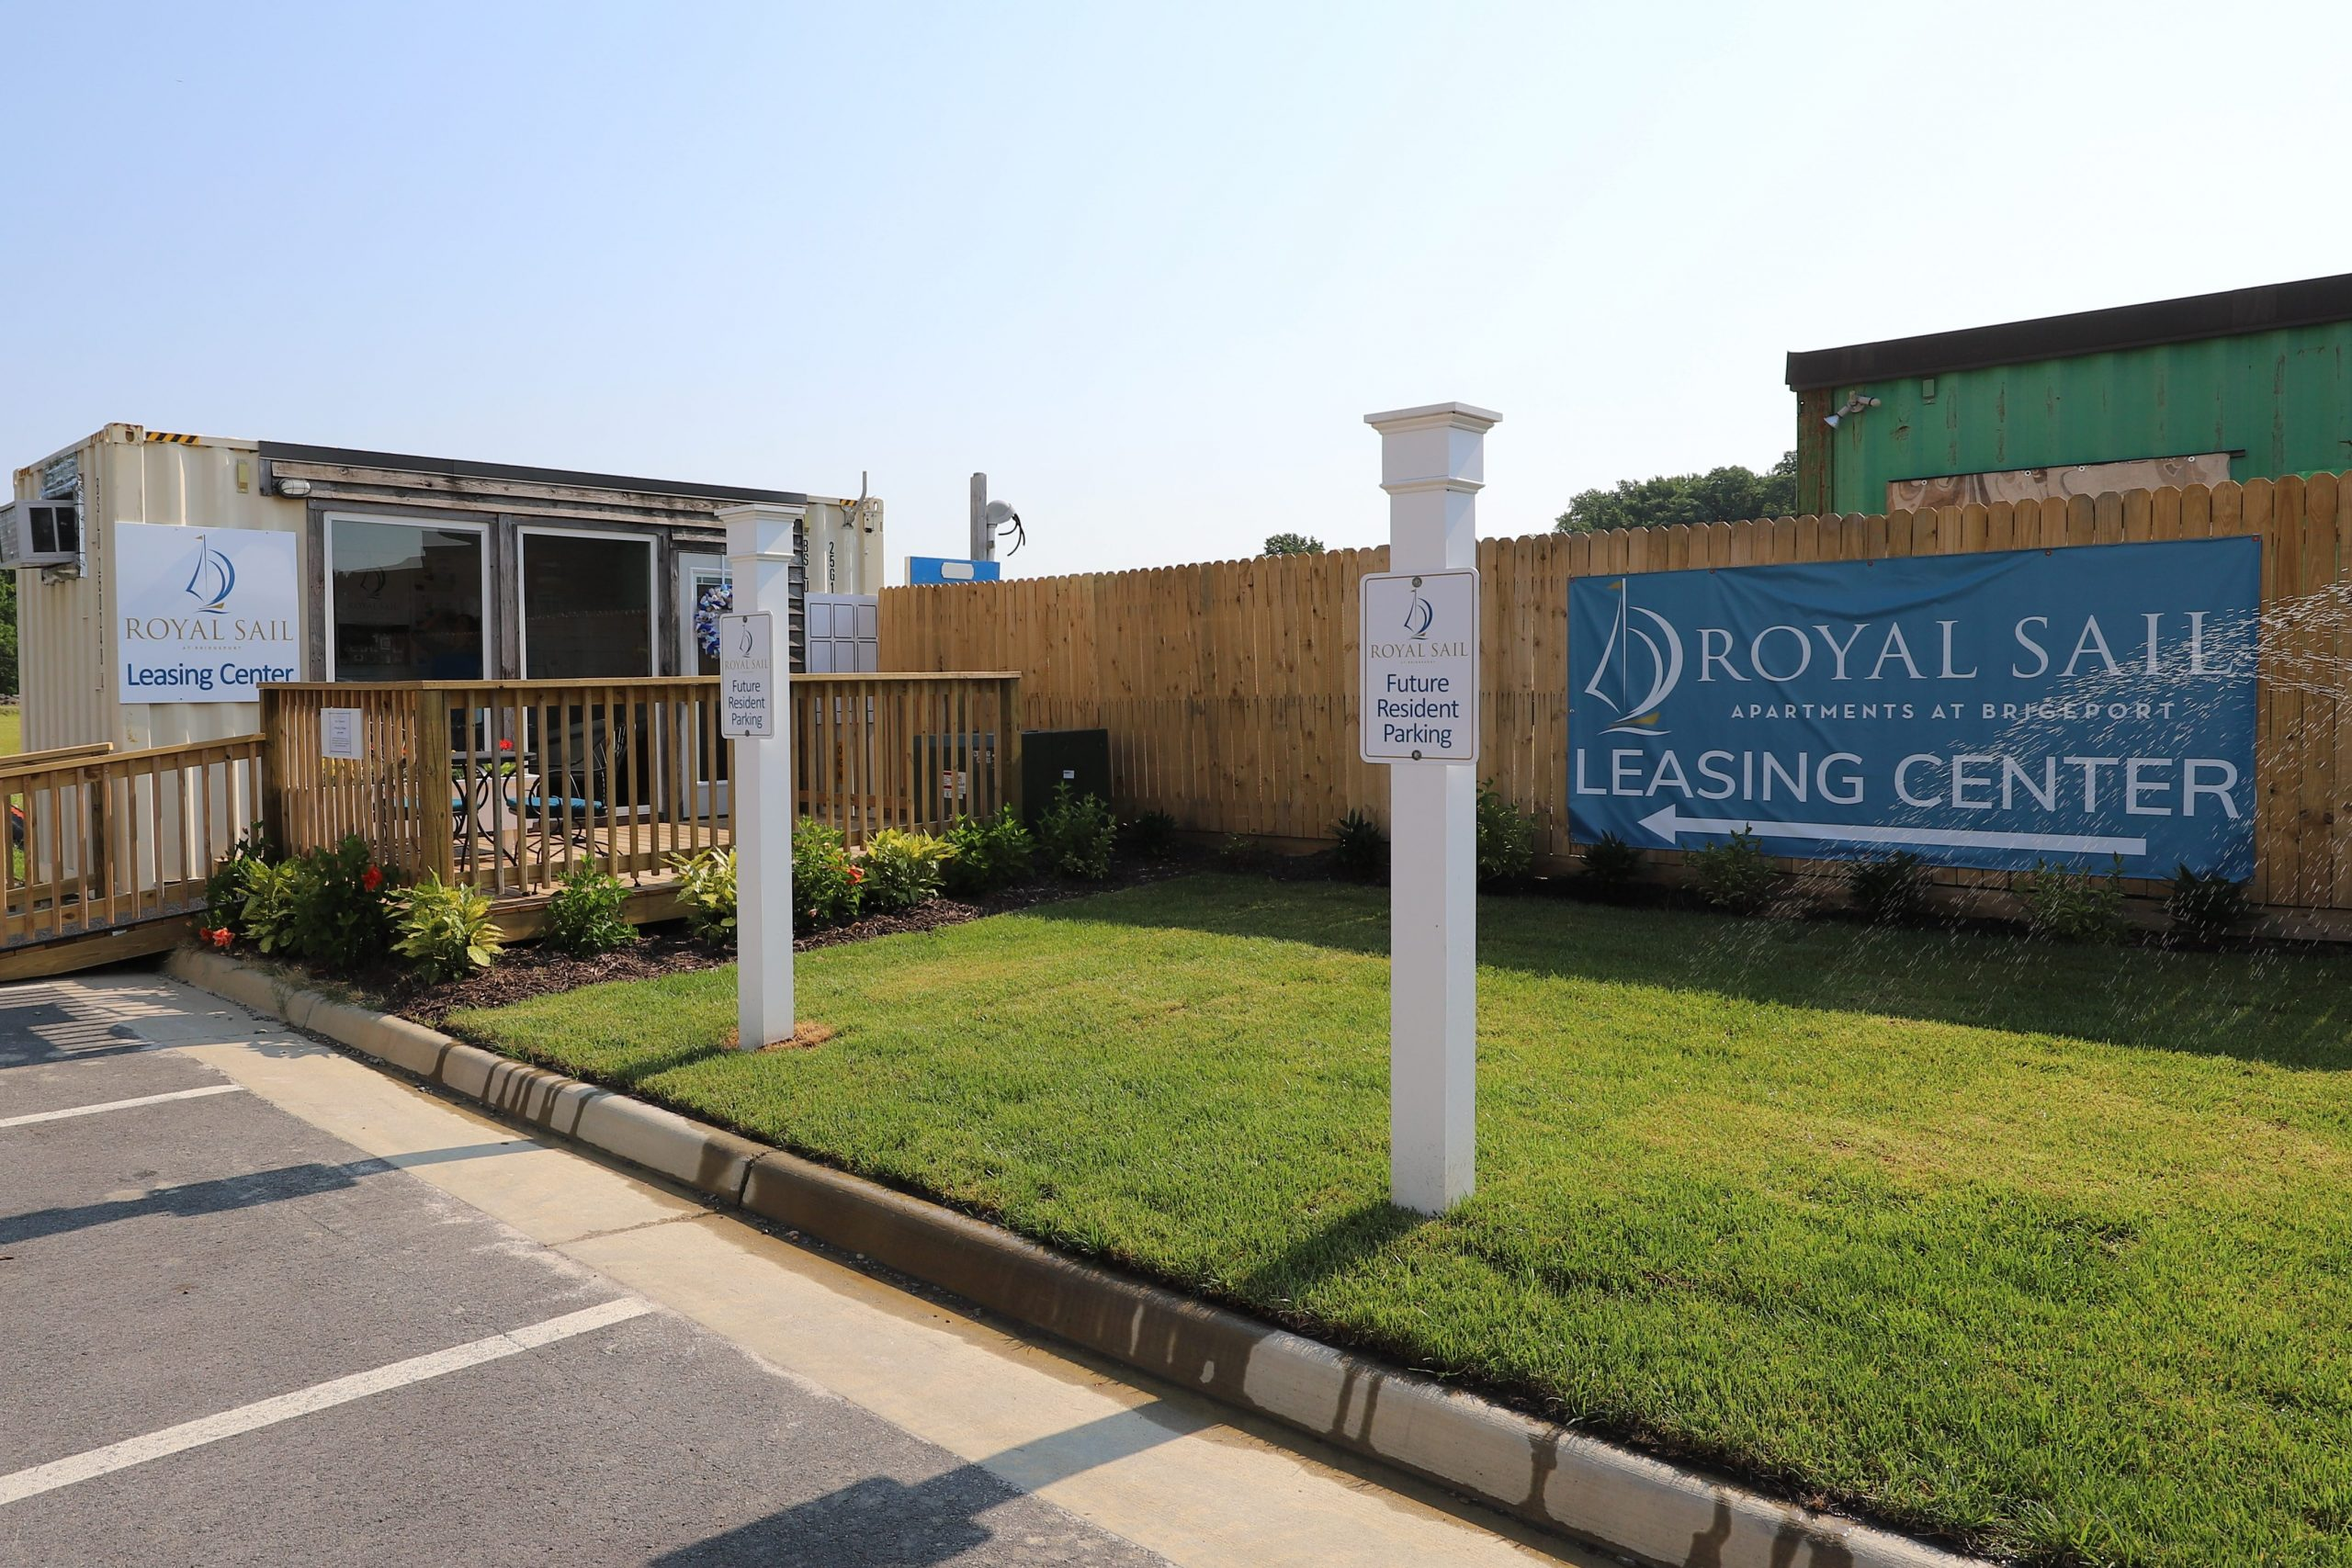 Royal Sail Apartments Leasing Center